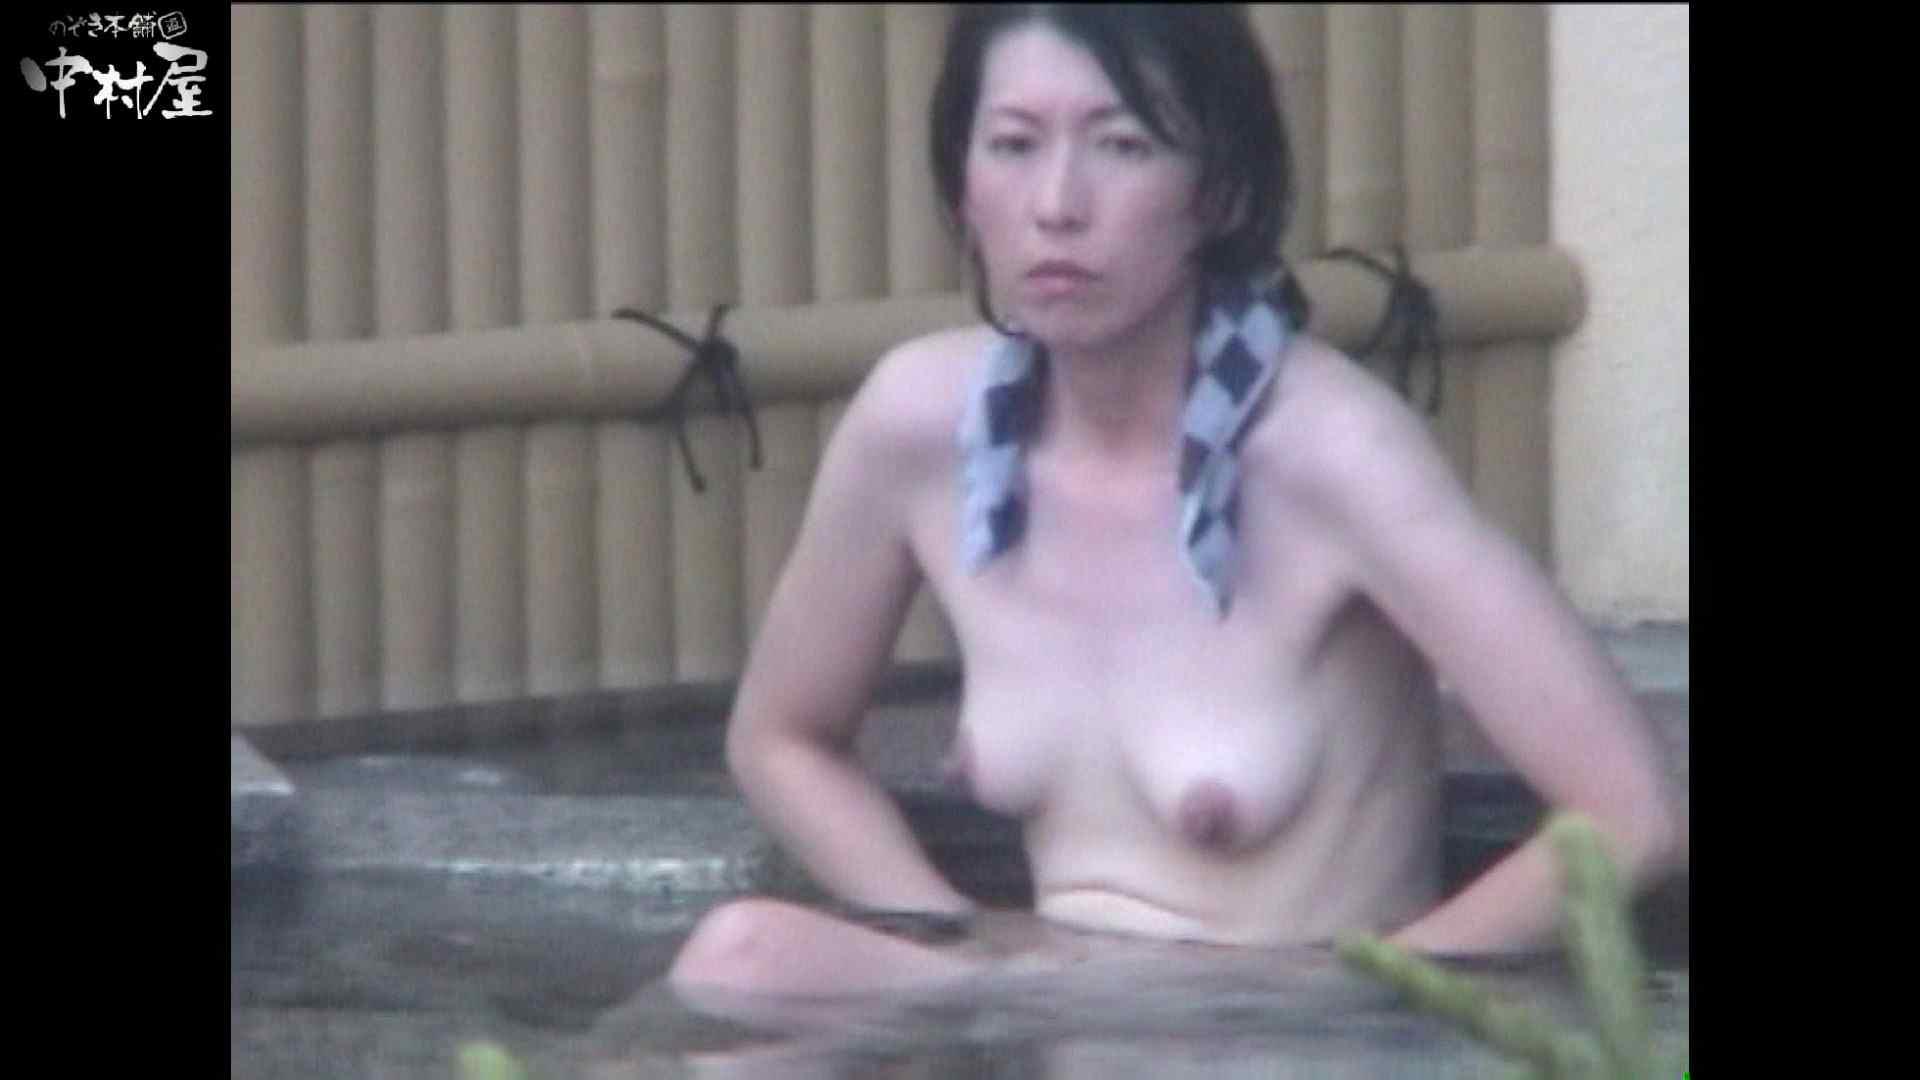 Aquaな露天風呂Vol.987 盗撮 | OLセックス  71画像 28